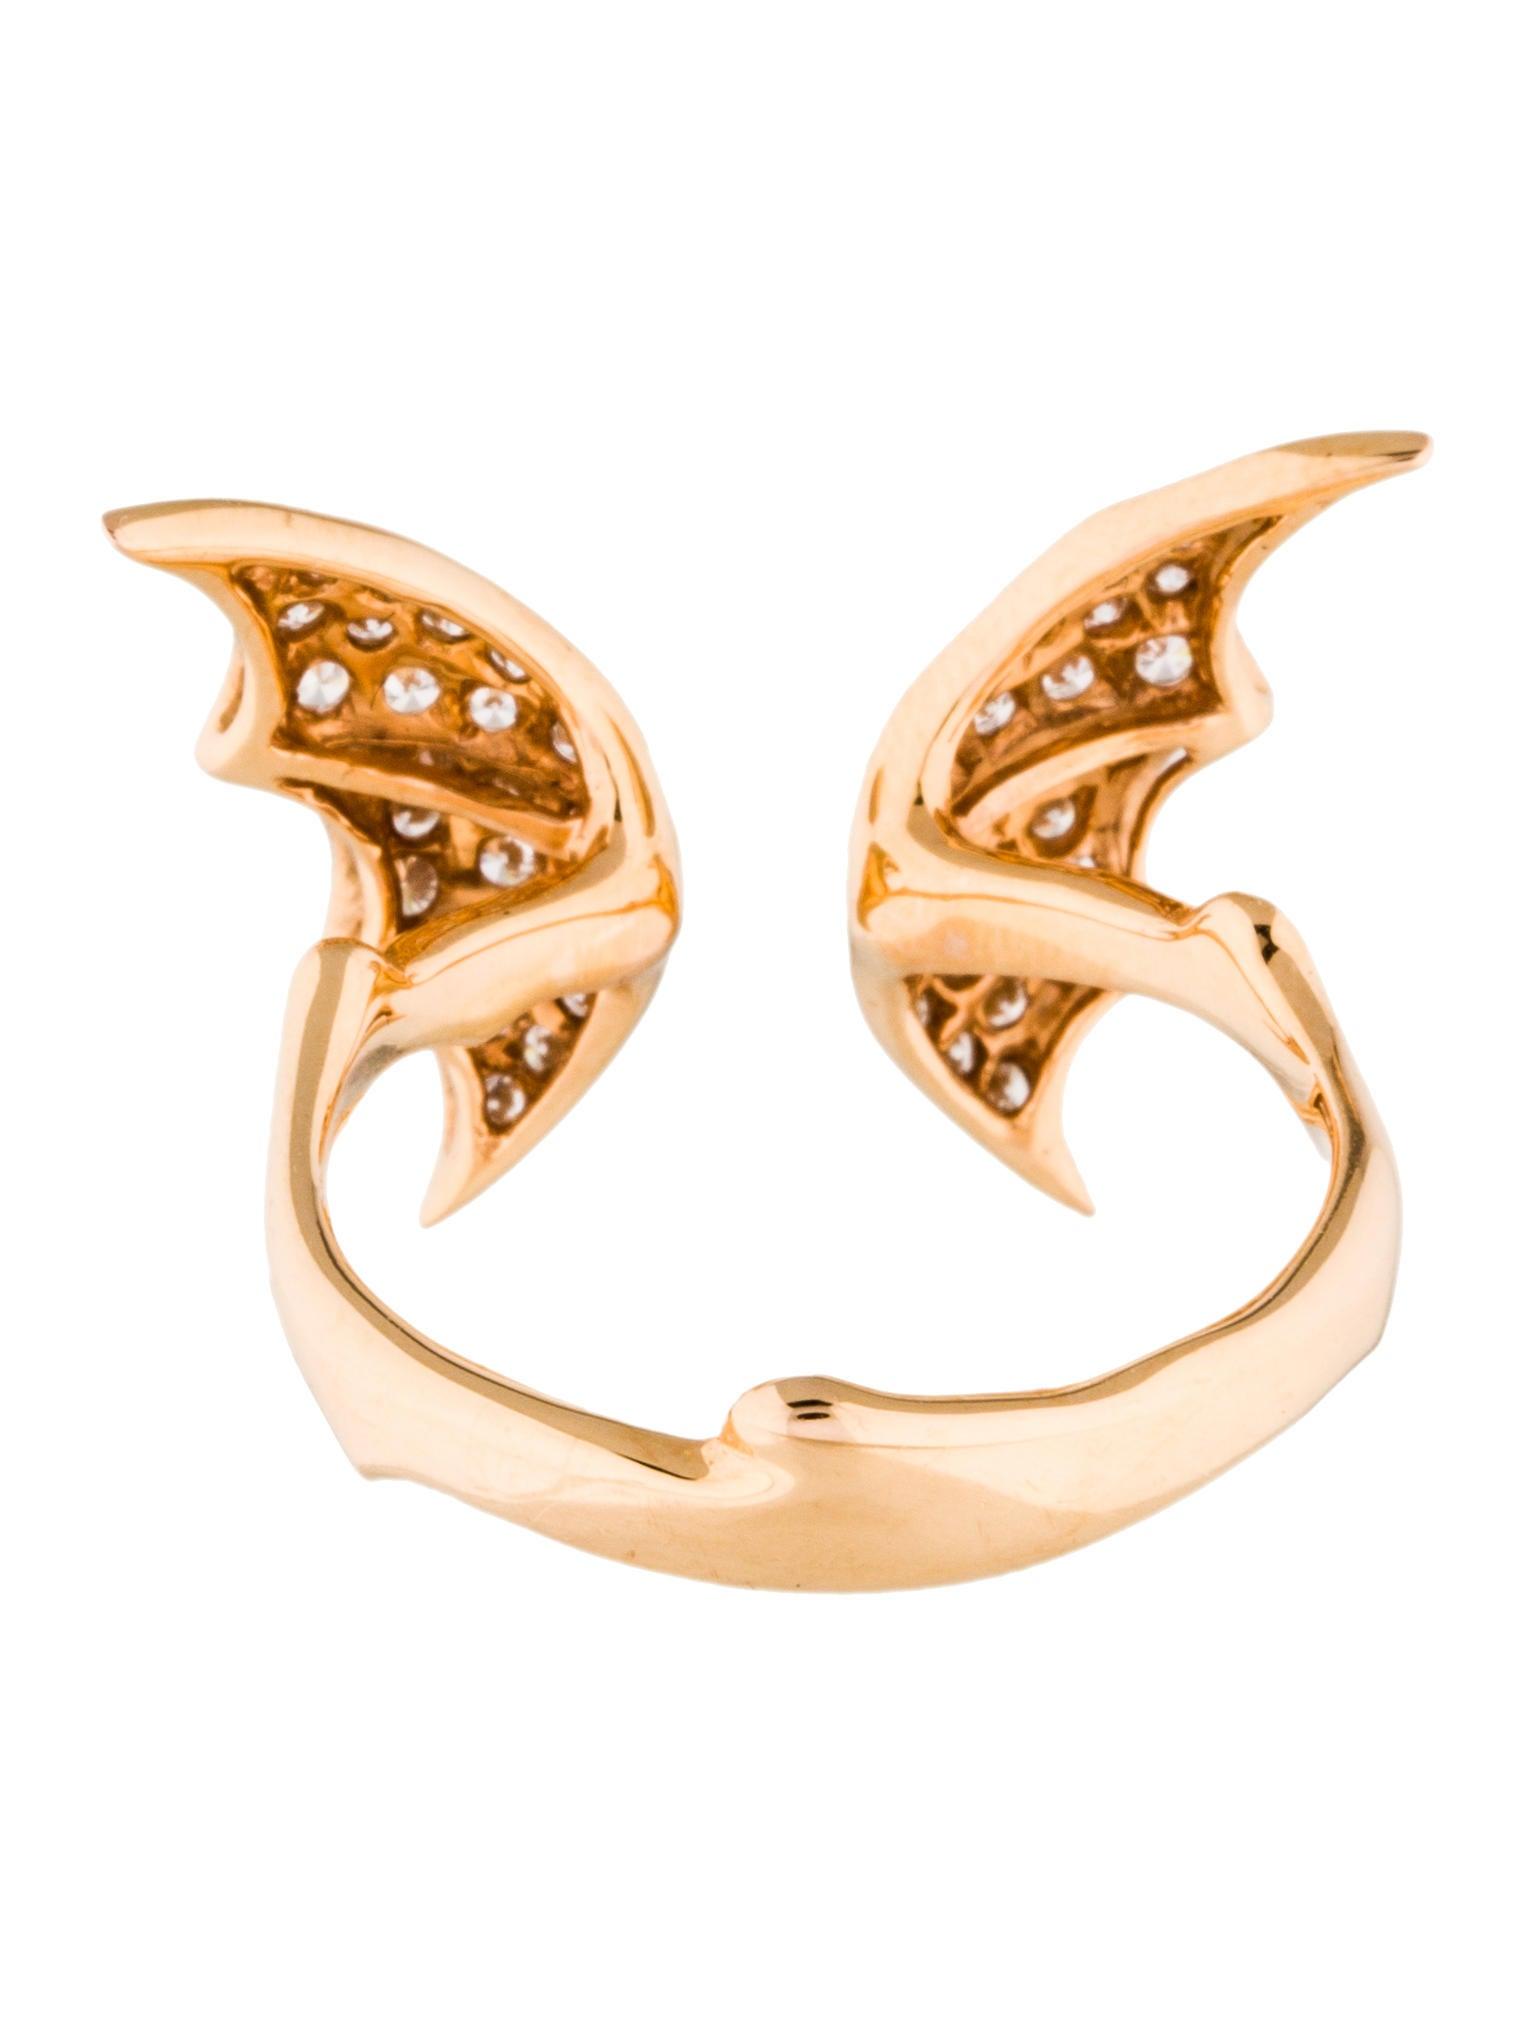 Stephen Webster 18K Diamond Fly By Night Ring Rings